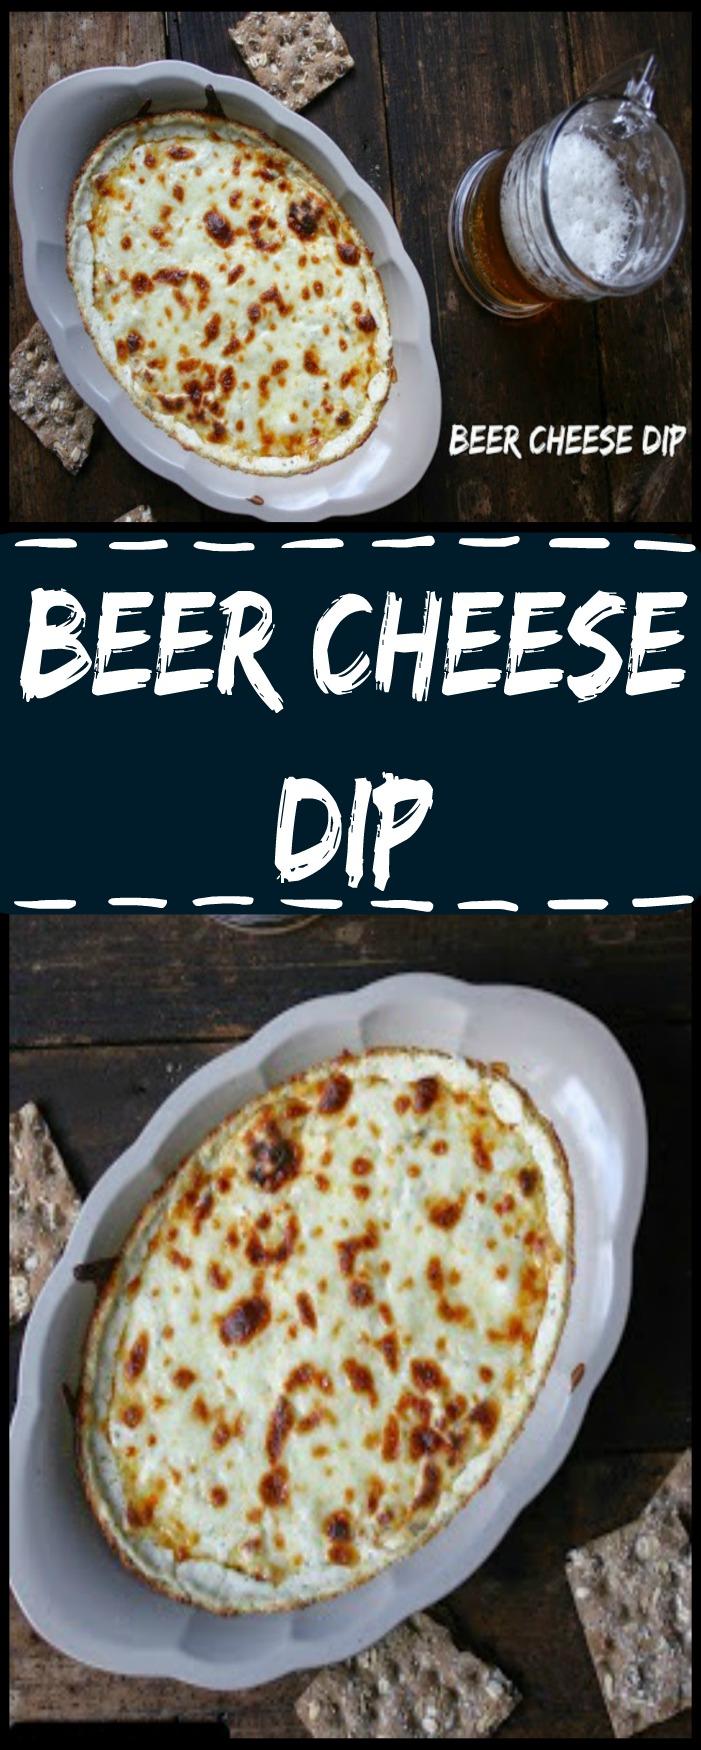 Hot bubbly Beer Cheese Dip made with 3 cheese, garlic, Dijon mustard and beer!